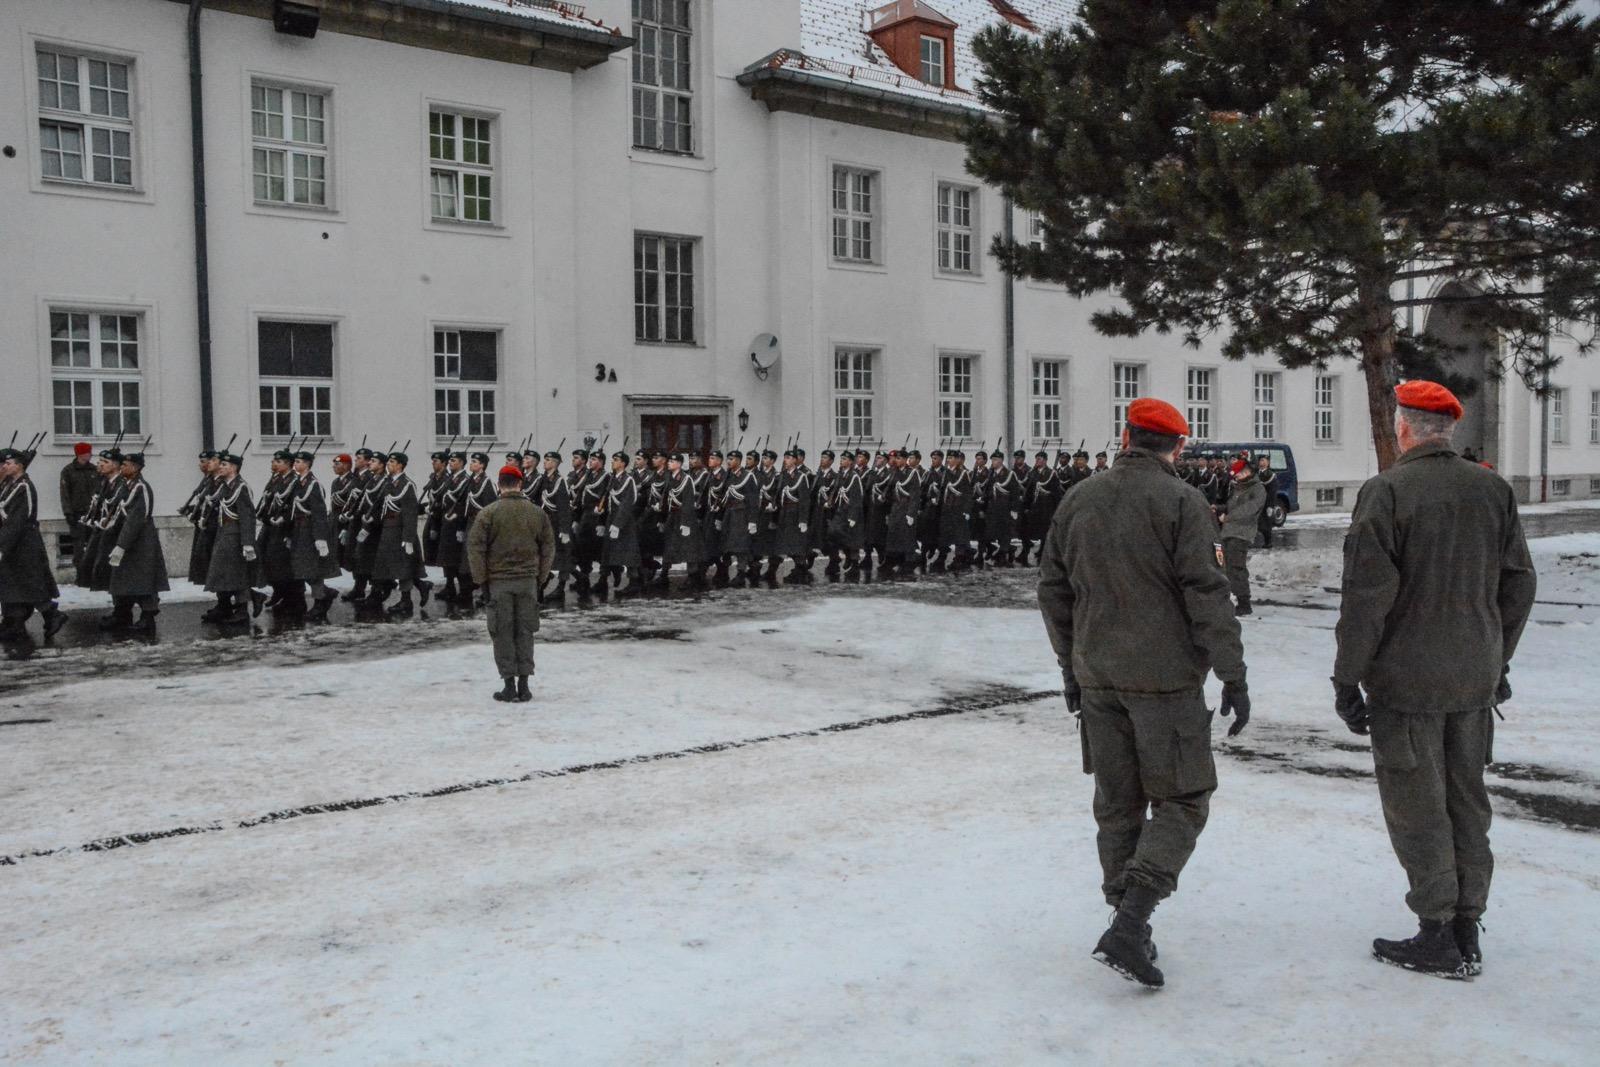 2019_01_04_1Gardekompanie_Zielüberprüfung - 3 of 8